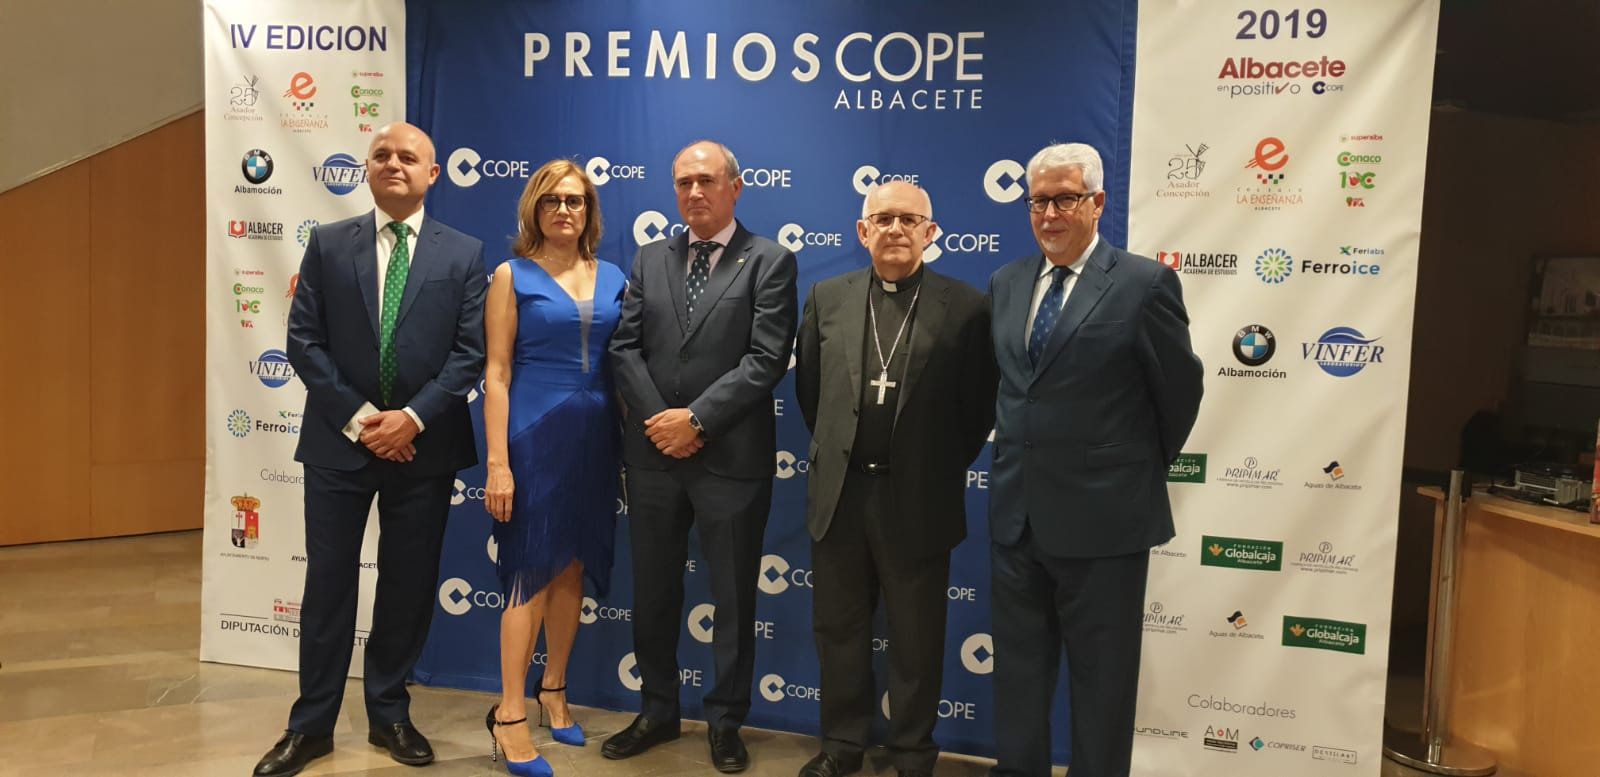 https://blog.globalcaja.es/wp-content/uploads/2019/10/Globalcaja-en-los-premios-Cadena-Cope-en-Albacete-.jpg